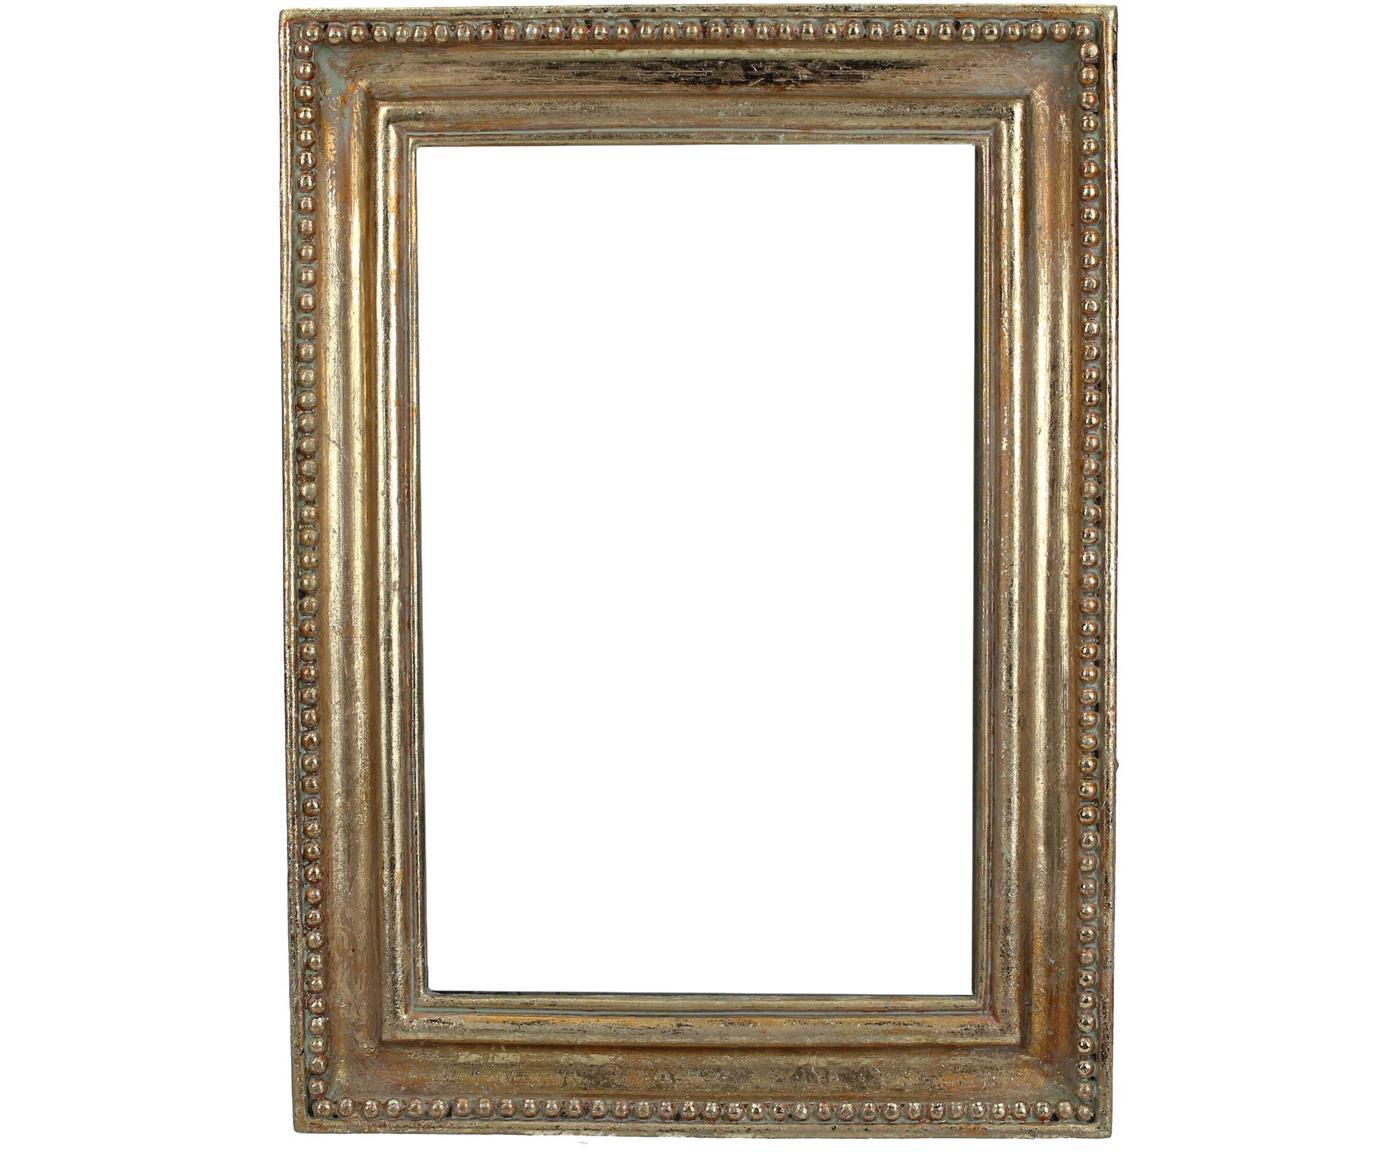 Cornice Antique, Cornice: poliresina, Dorato, 13 x 18 cm